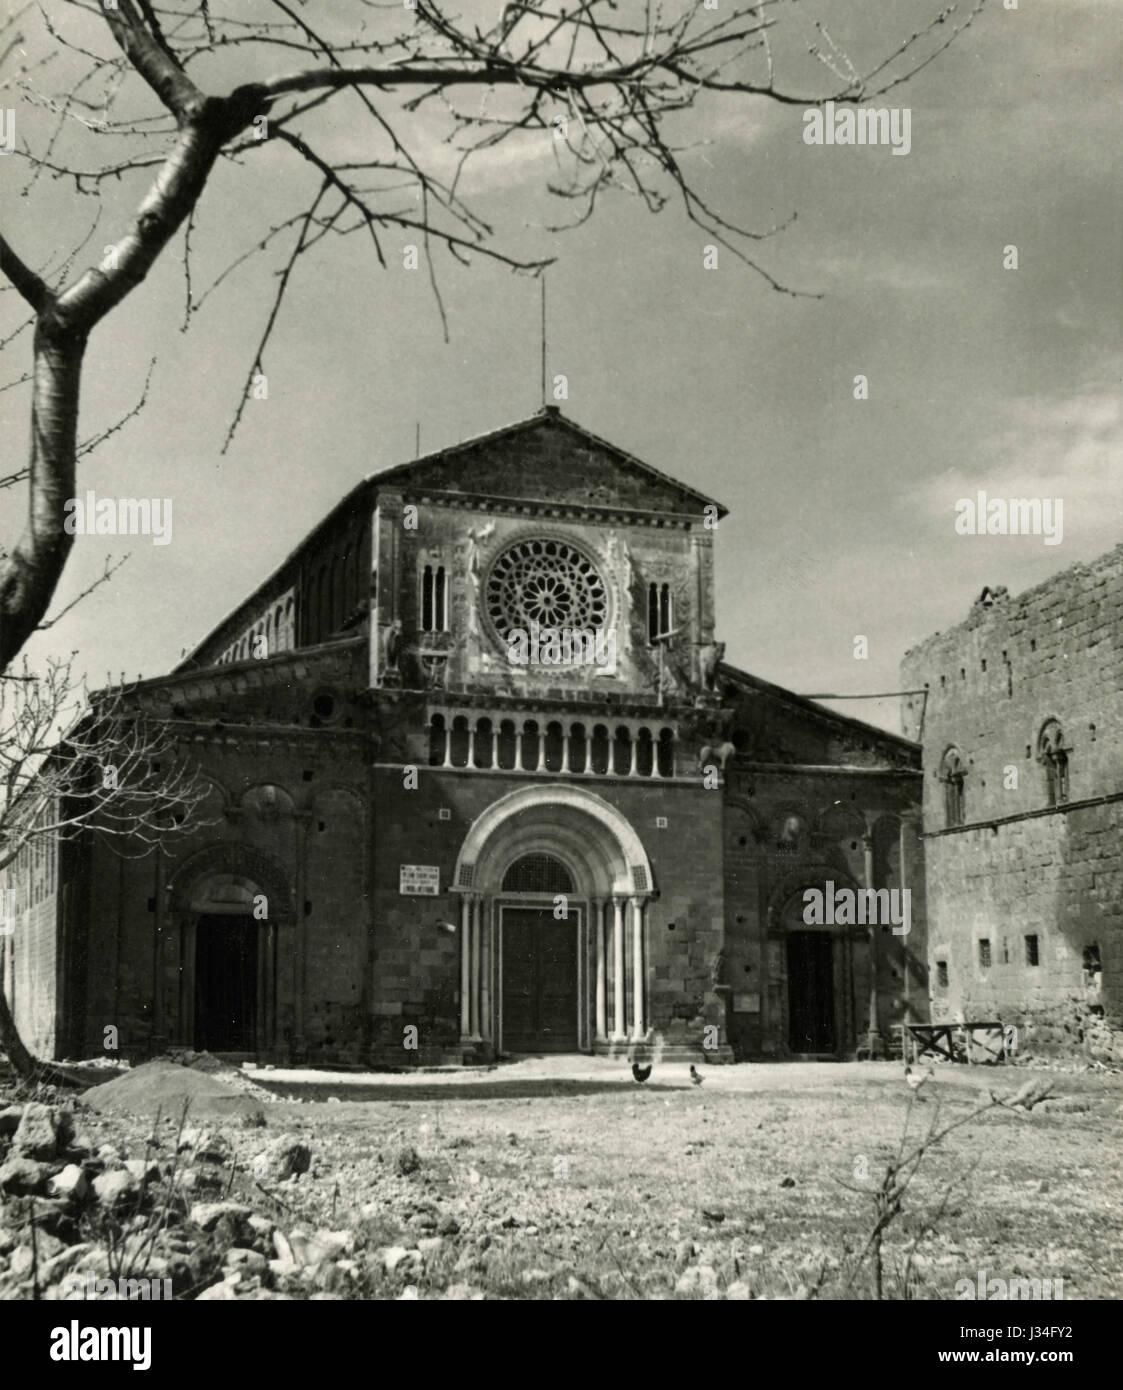 St. Peter's church, Tuscania, Italy - Stock Image